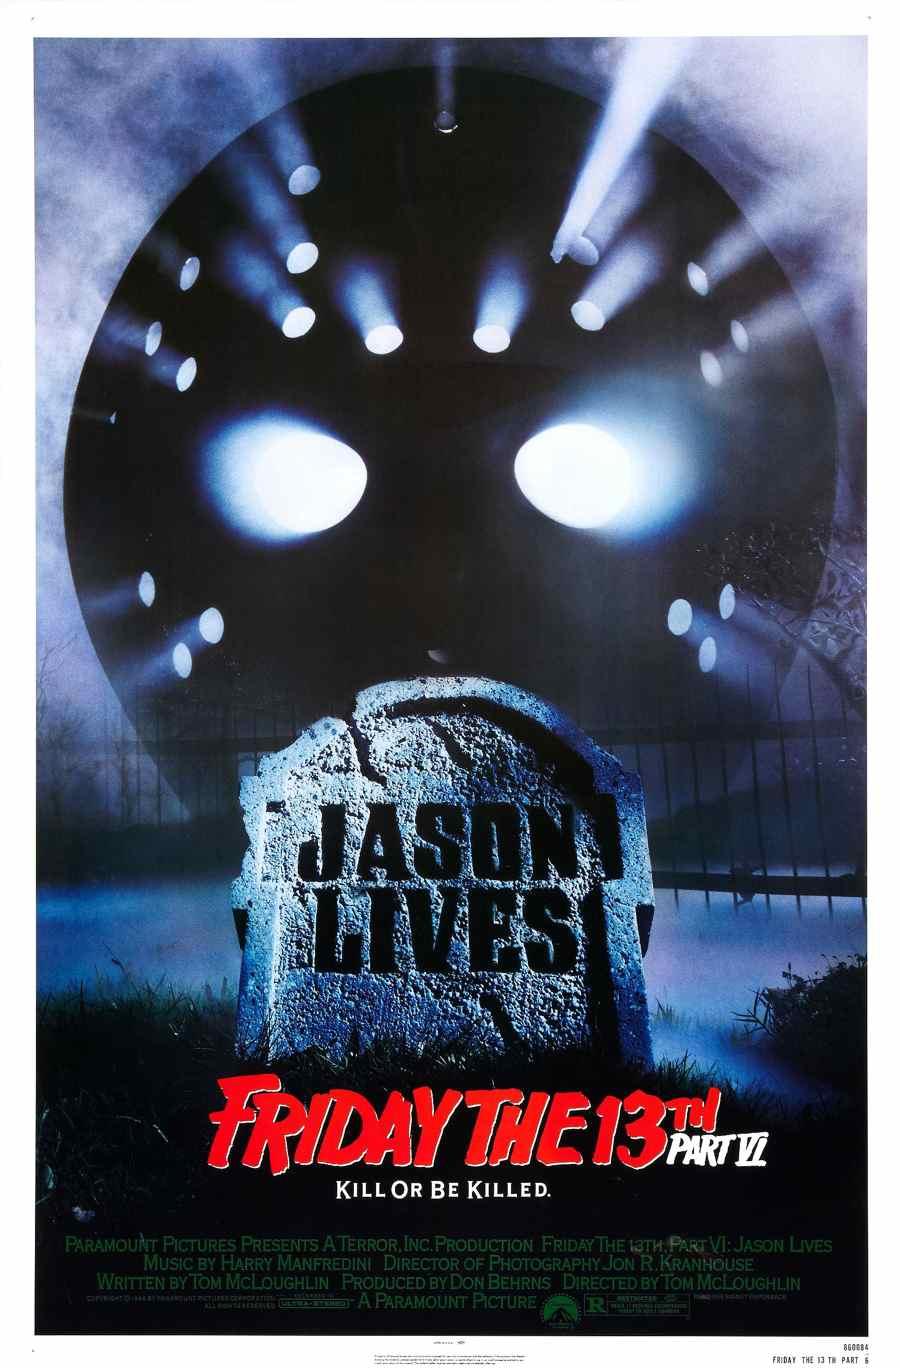 Friday the 13th Part VI Jason Lives poster